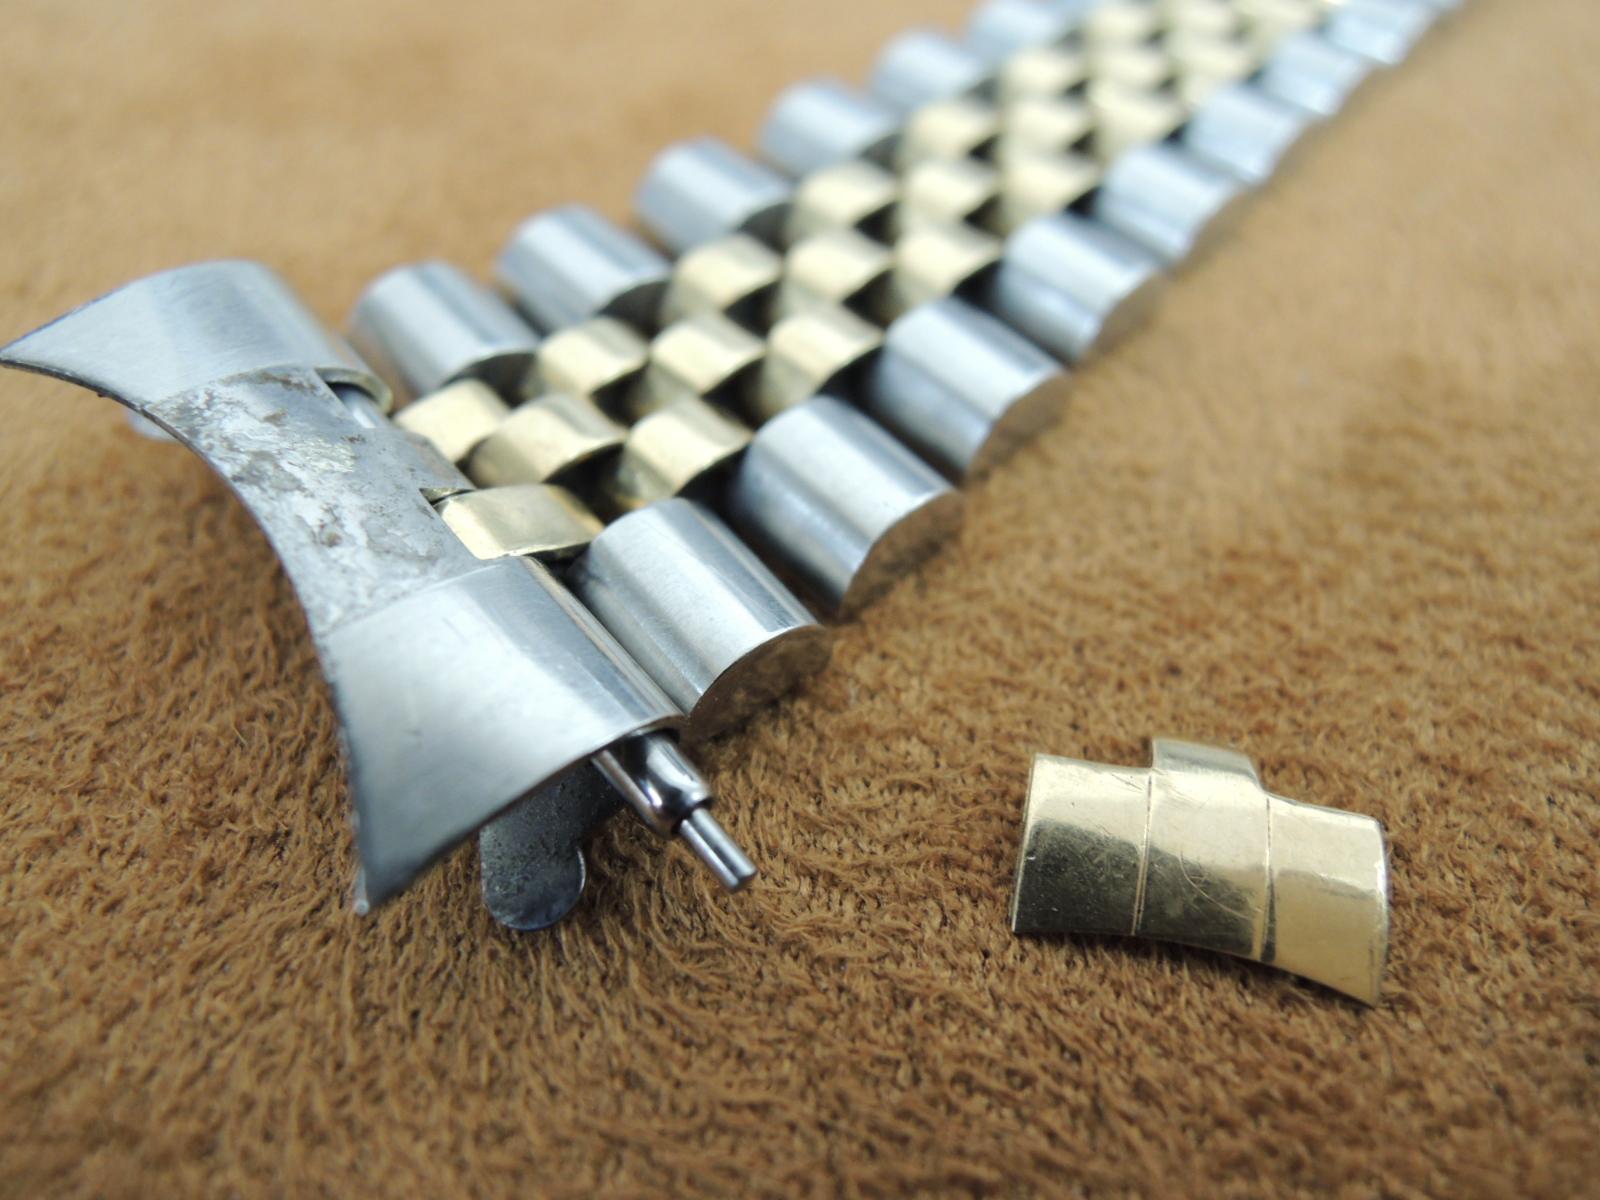 online store 9bb4a f7865 ロレックスのベルト修理 | 時計修理 リペア Watch事業部